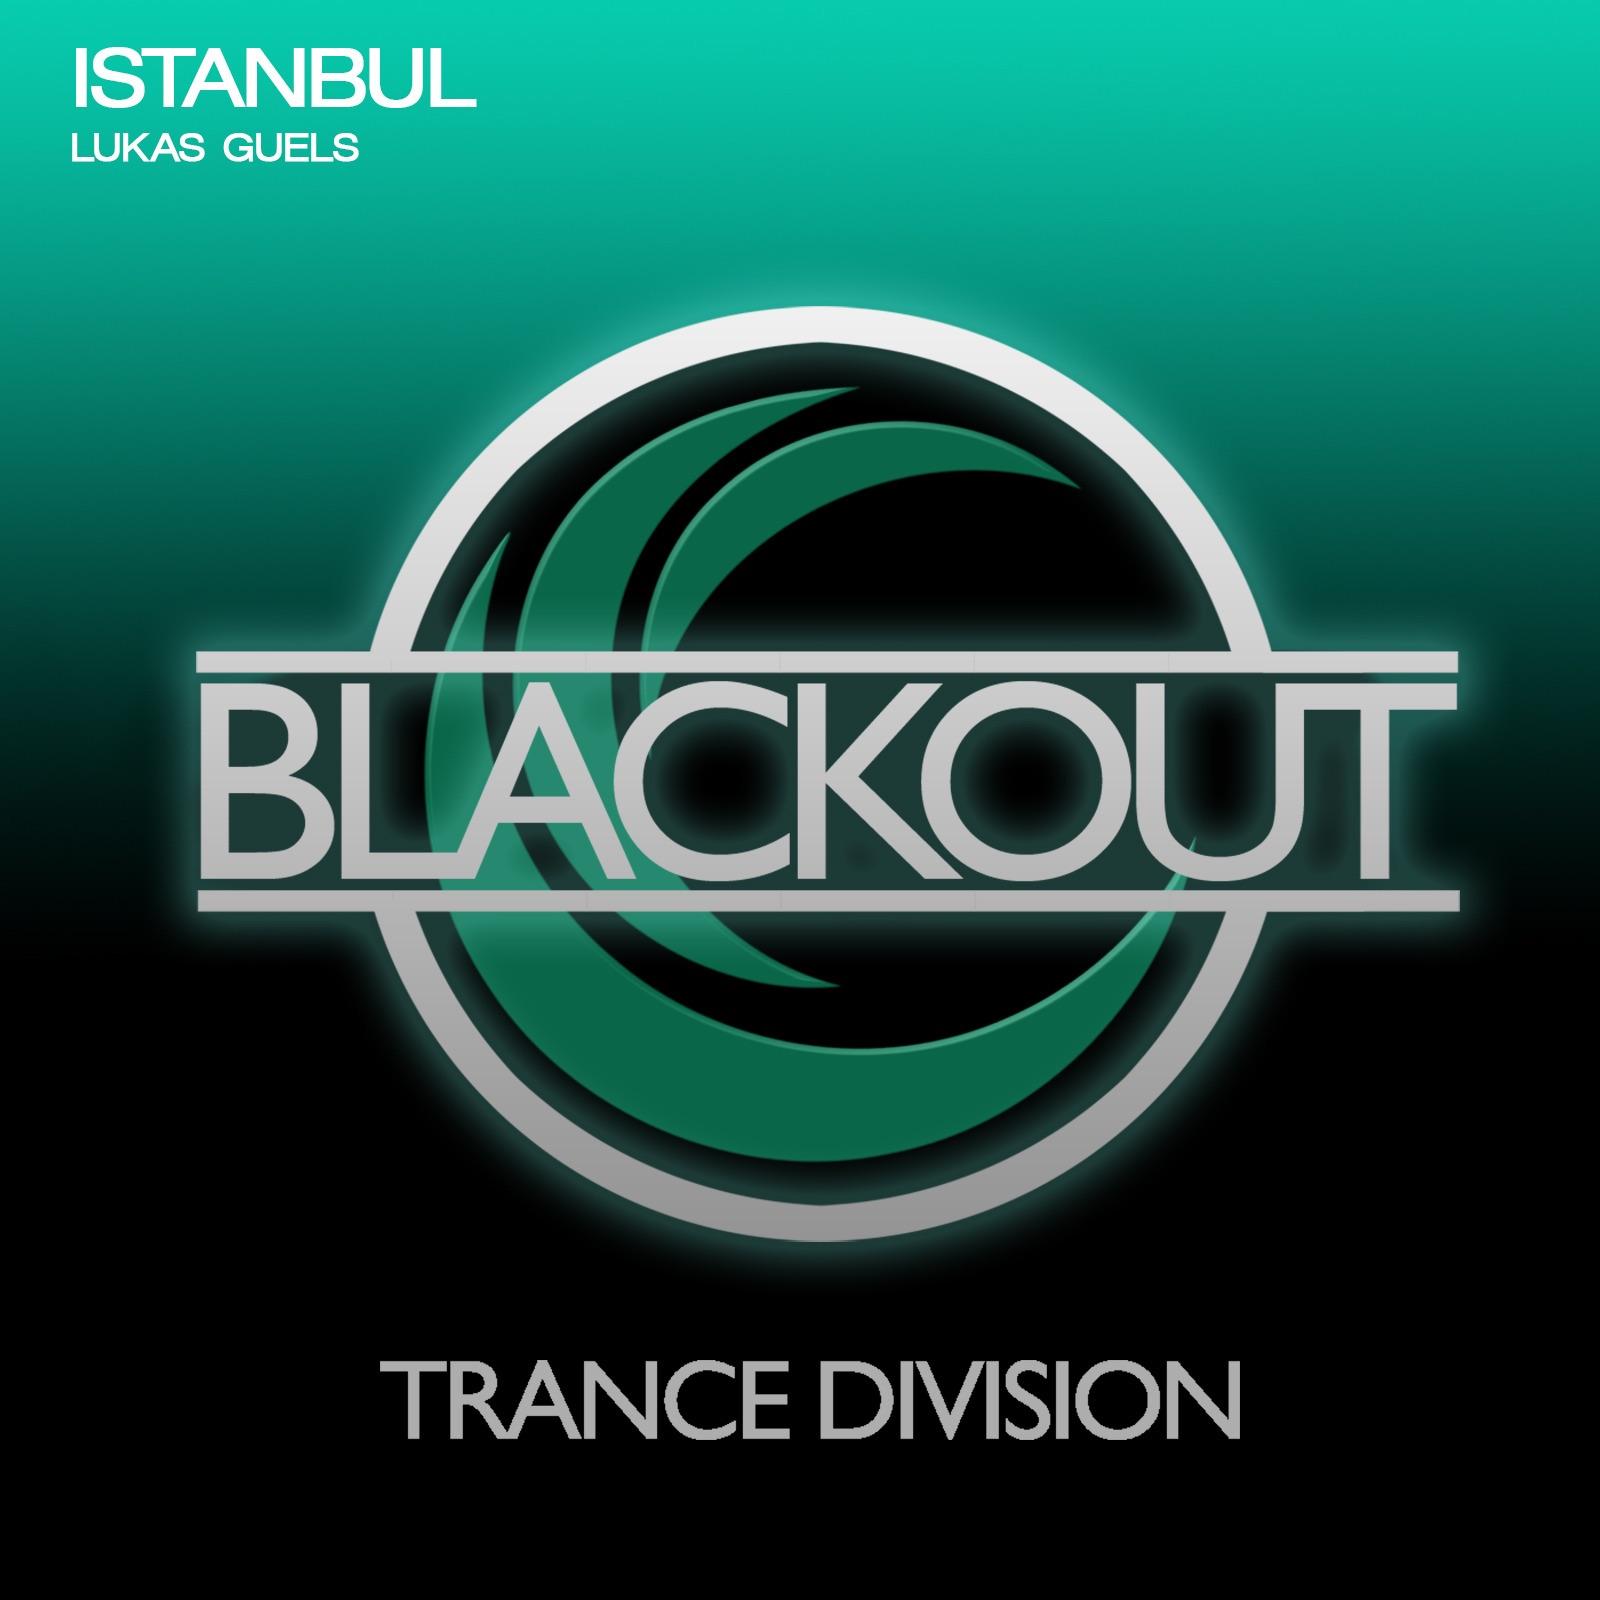 Istanbul - Single